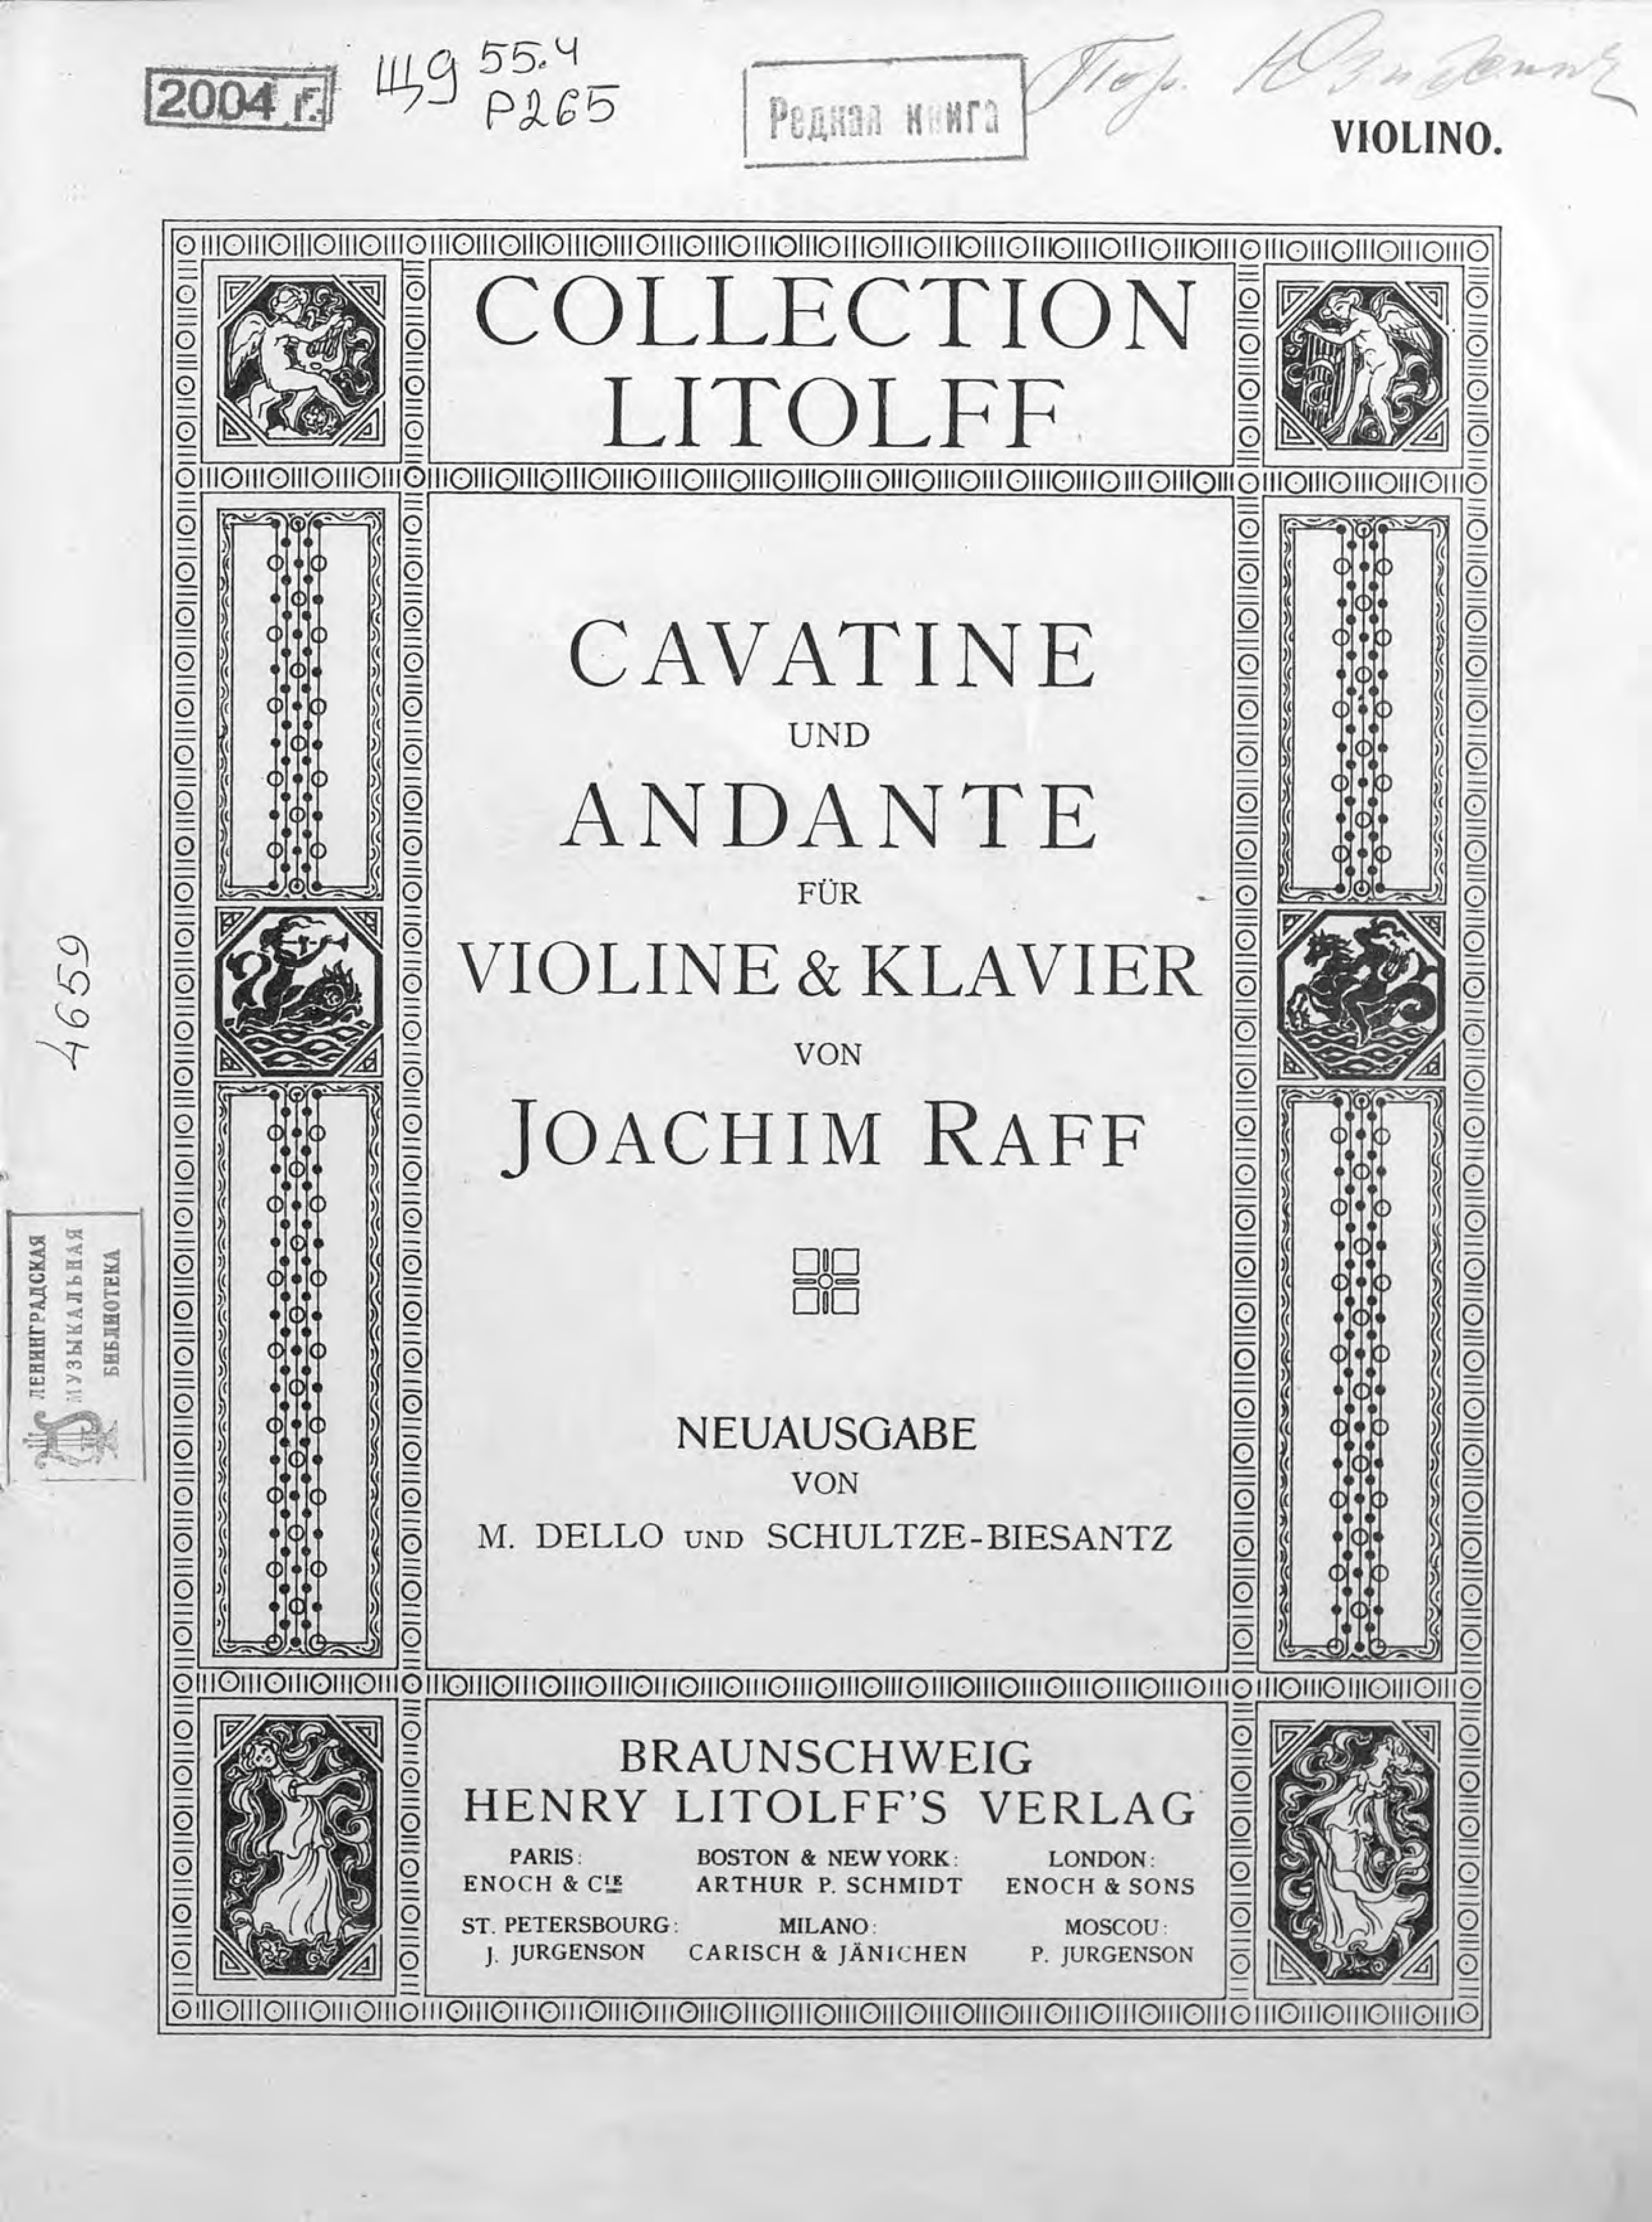 Йозеф Иоахим Рафф Cavatine, op. 85, № 3 und Andante fur violine & Klavier von J. Raff k davydov cello concerto no 3 op 18